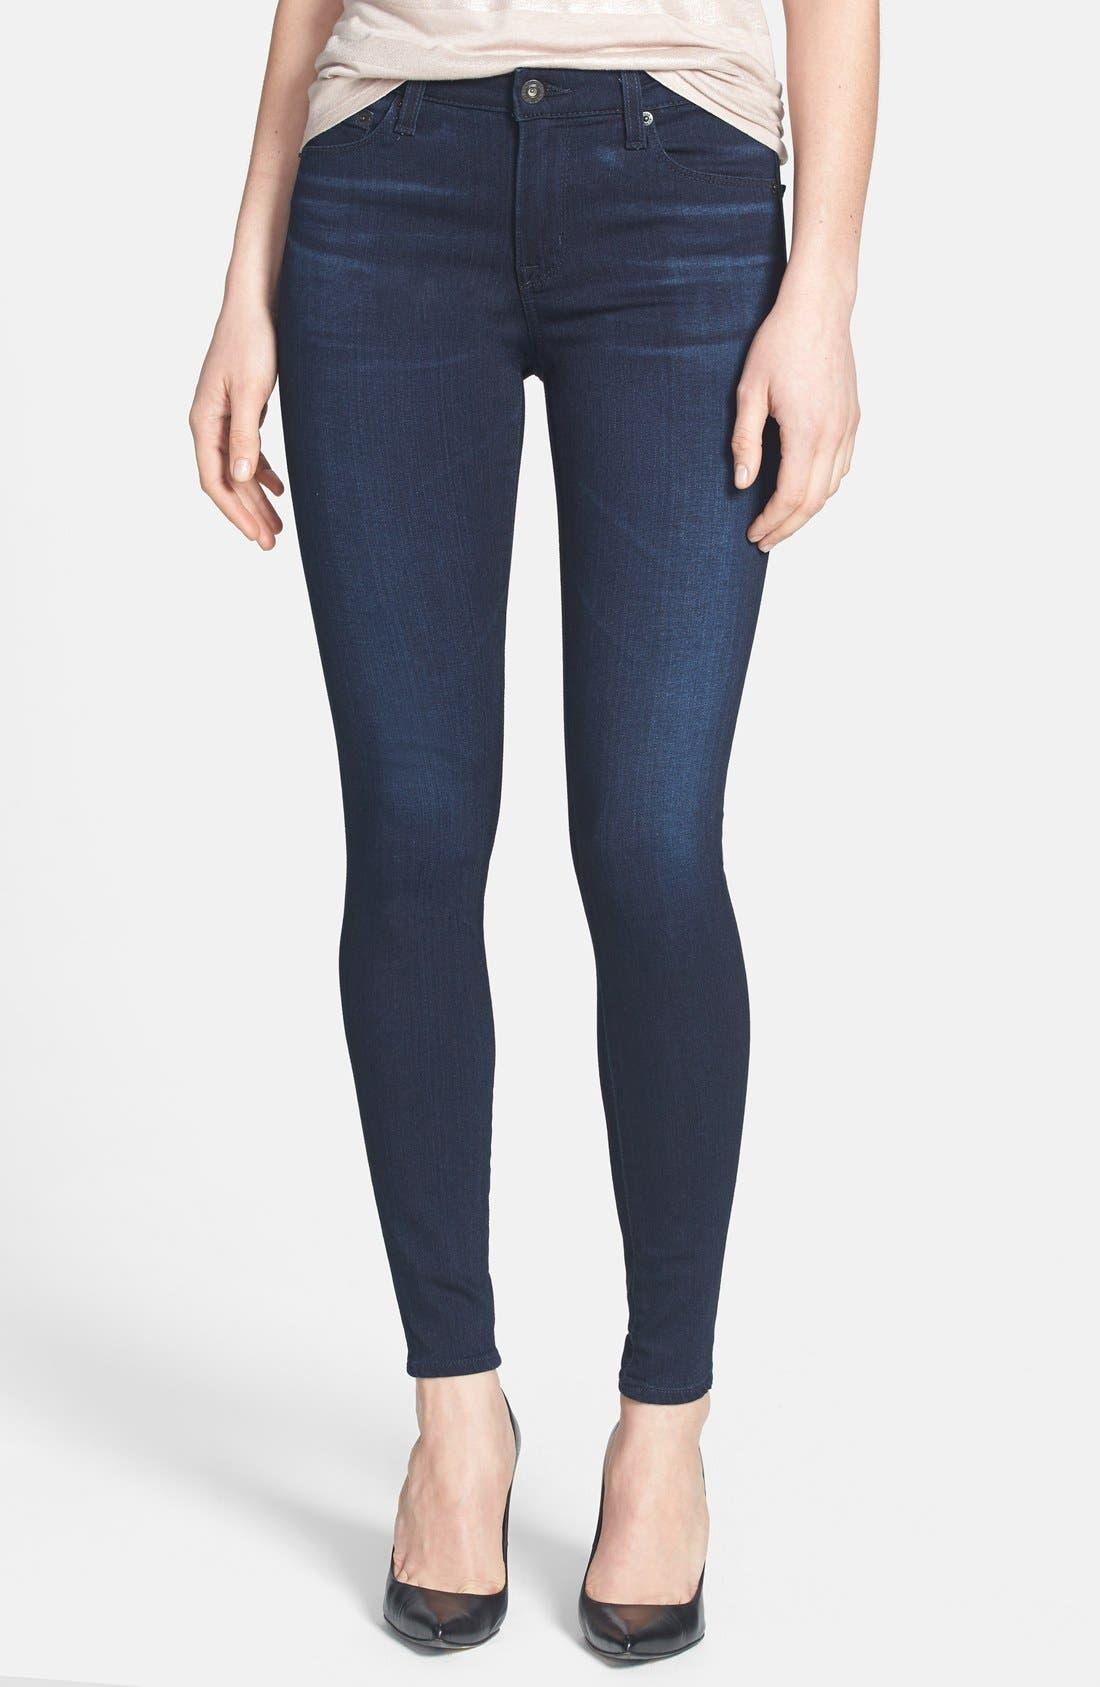 Main Image - Big Star 'Ava' Jeans Super Skinny Stretch Jeans (Harmony Dark) (Petite)